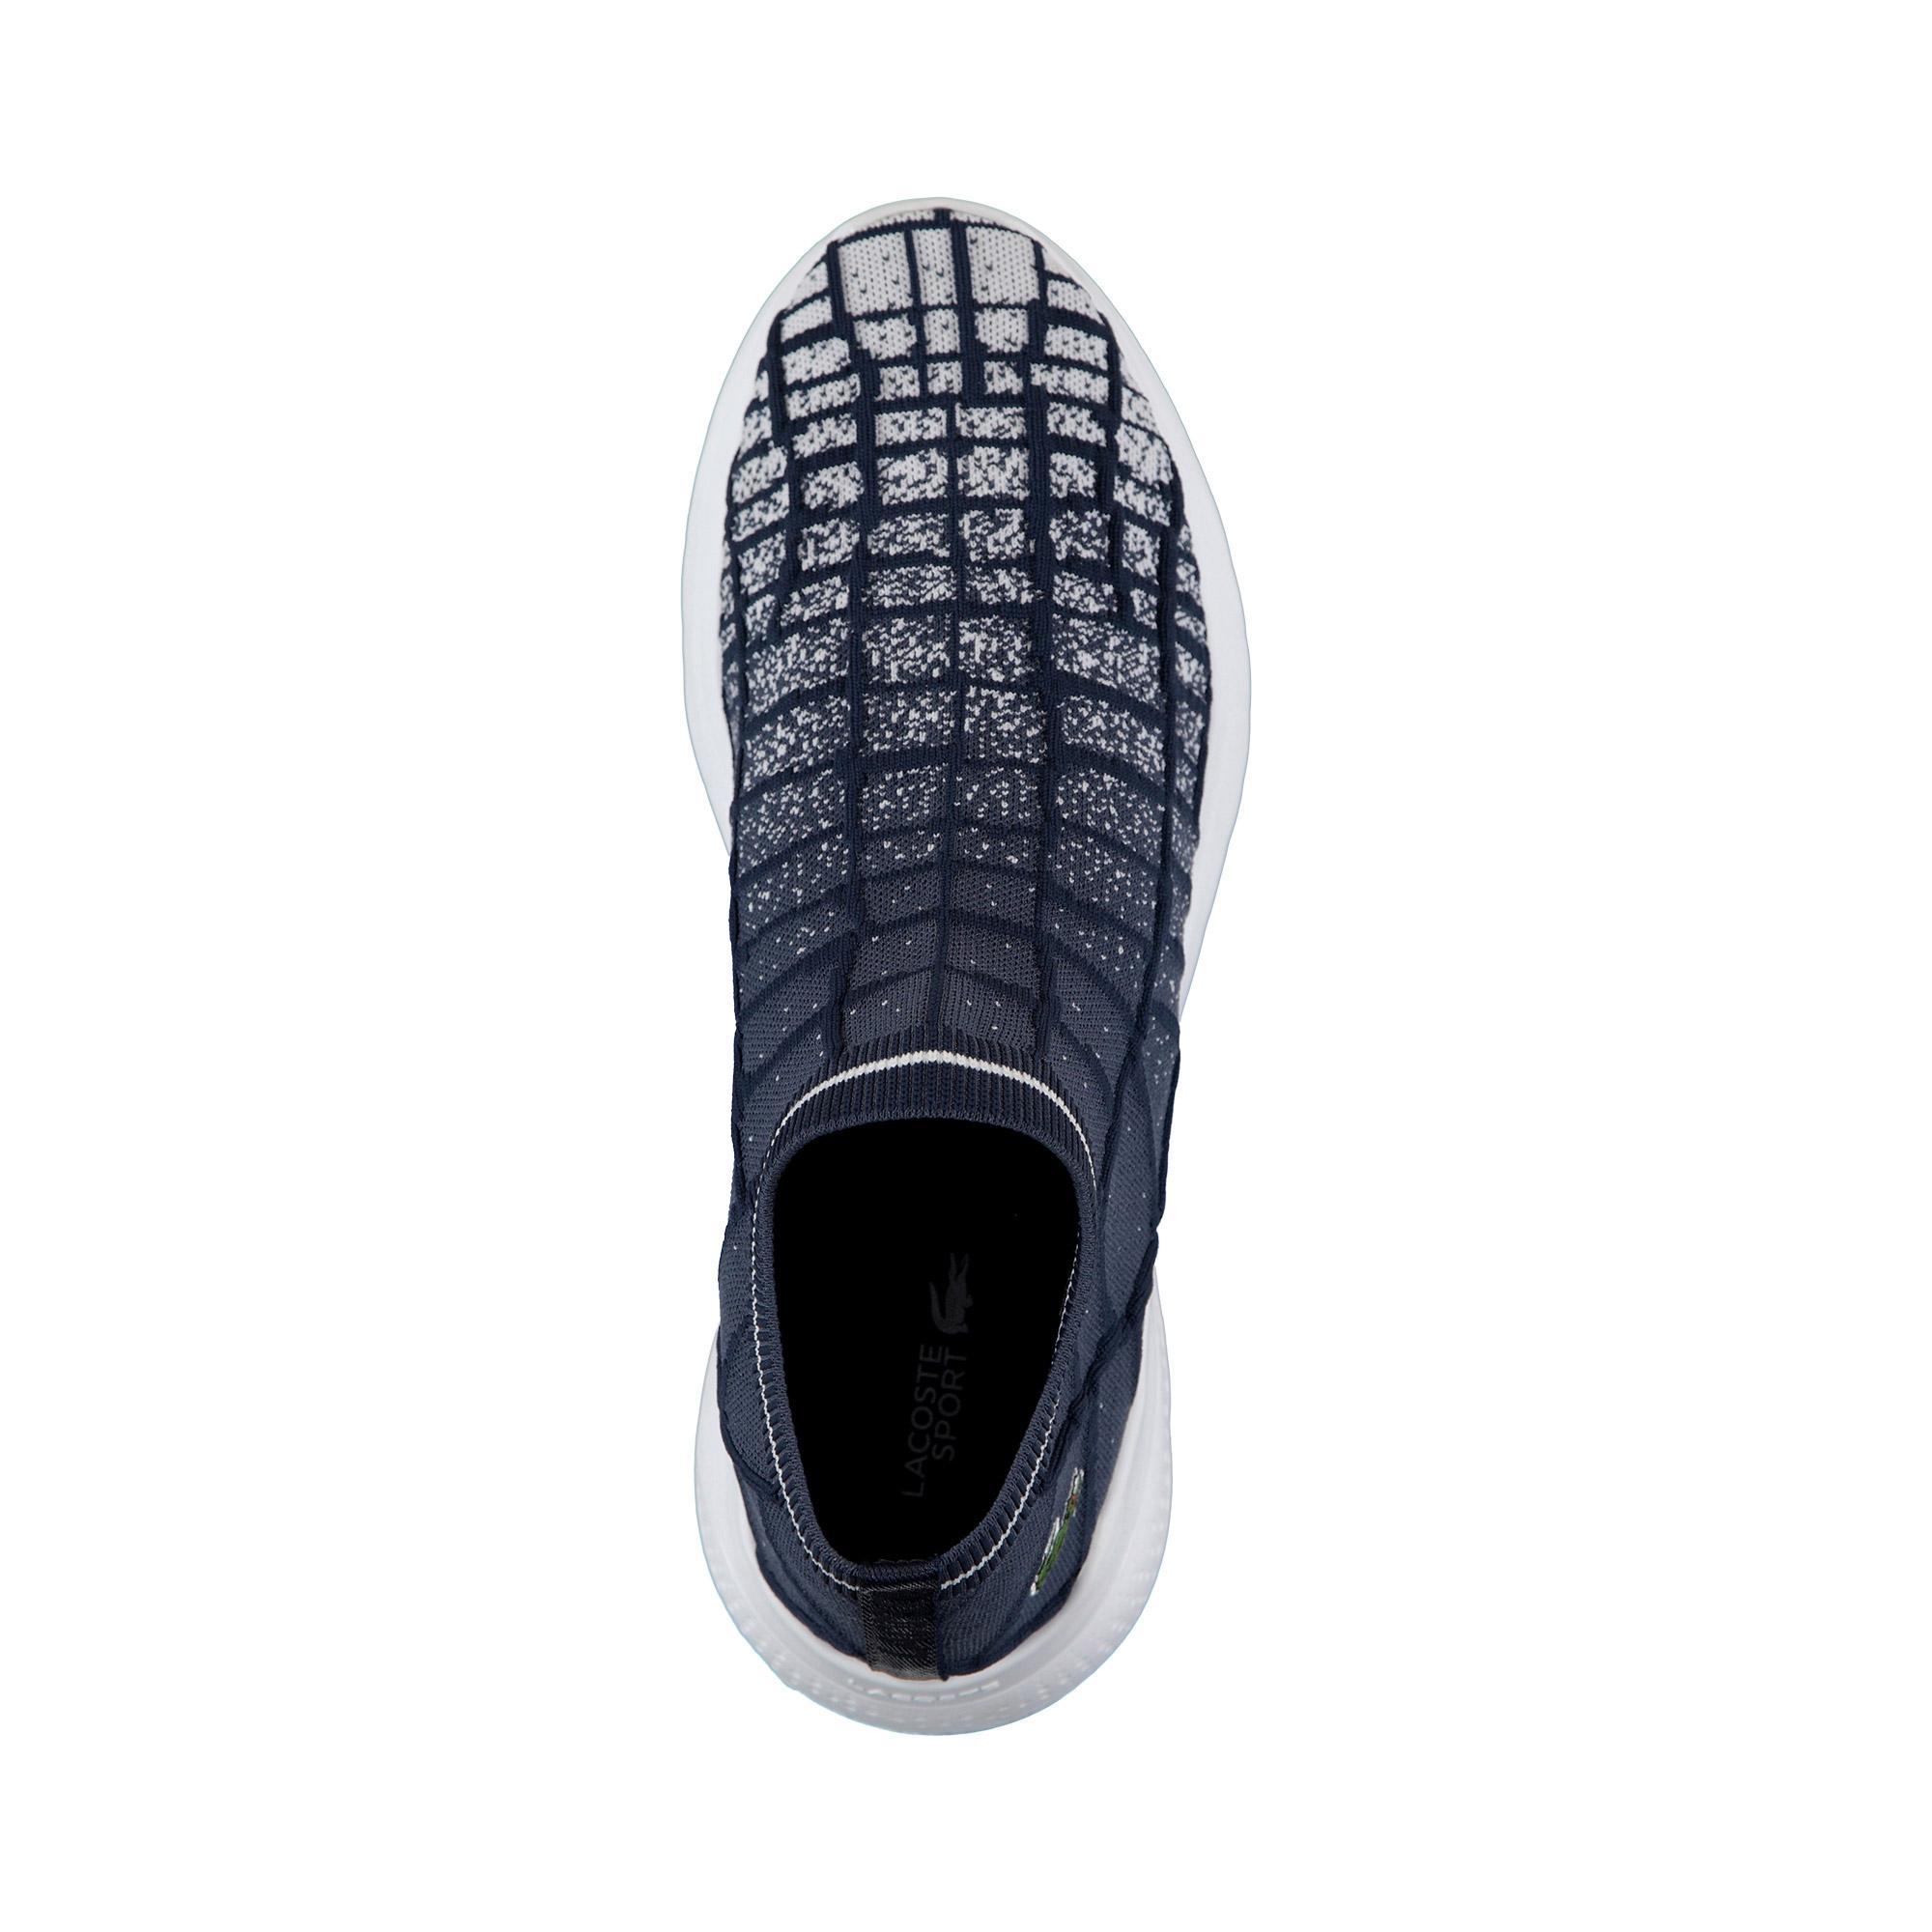 Lacoste кросівки чоловічі LT Fit Sock